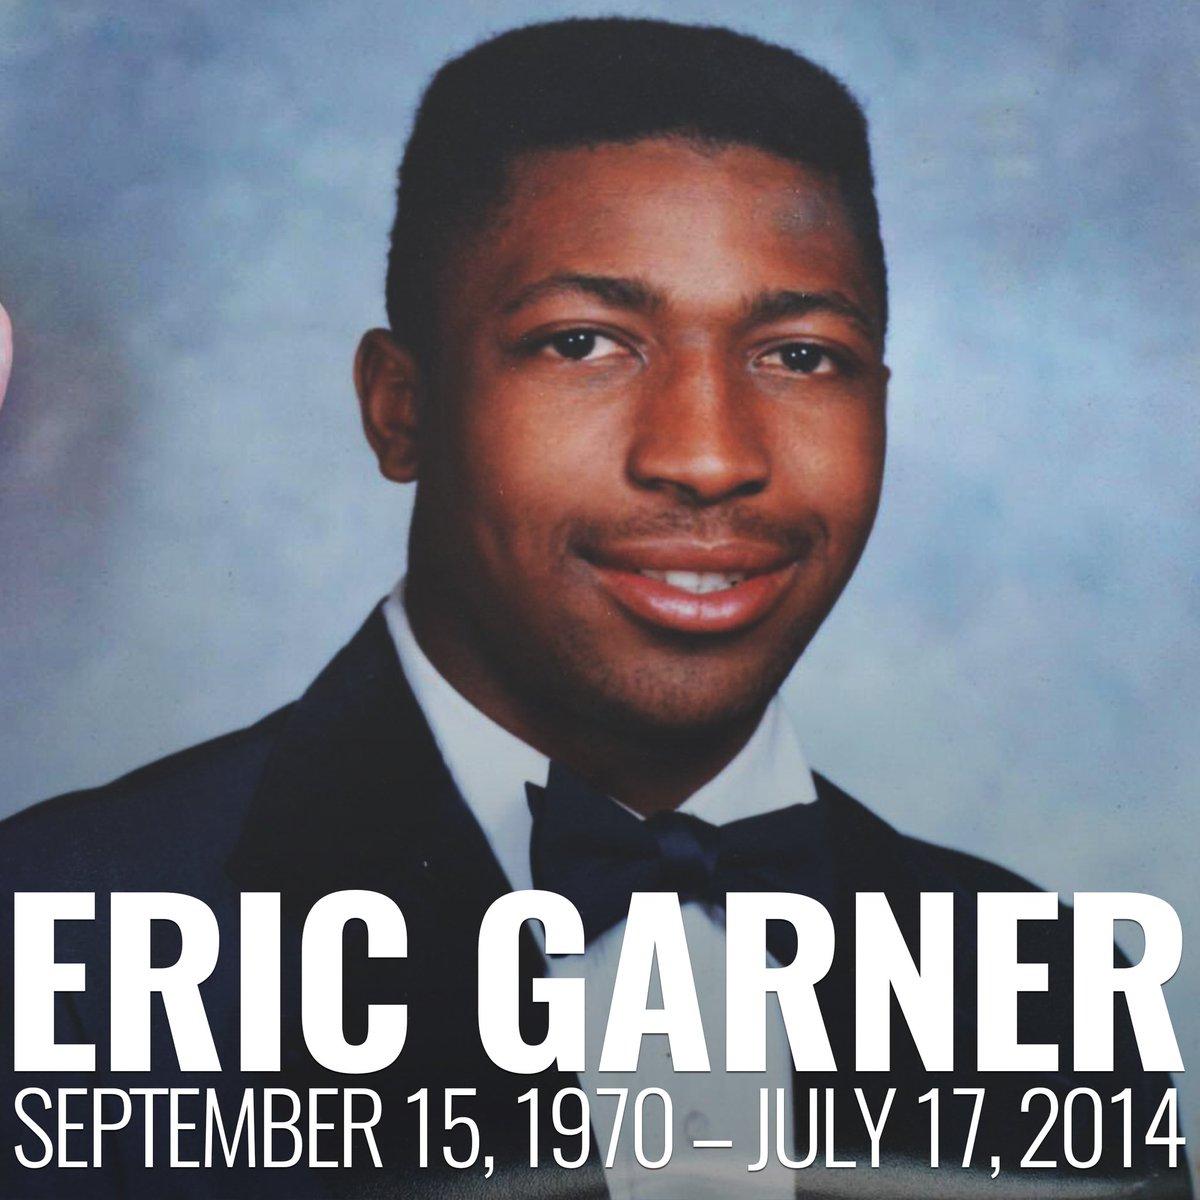 #EricGarner